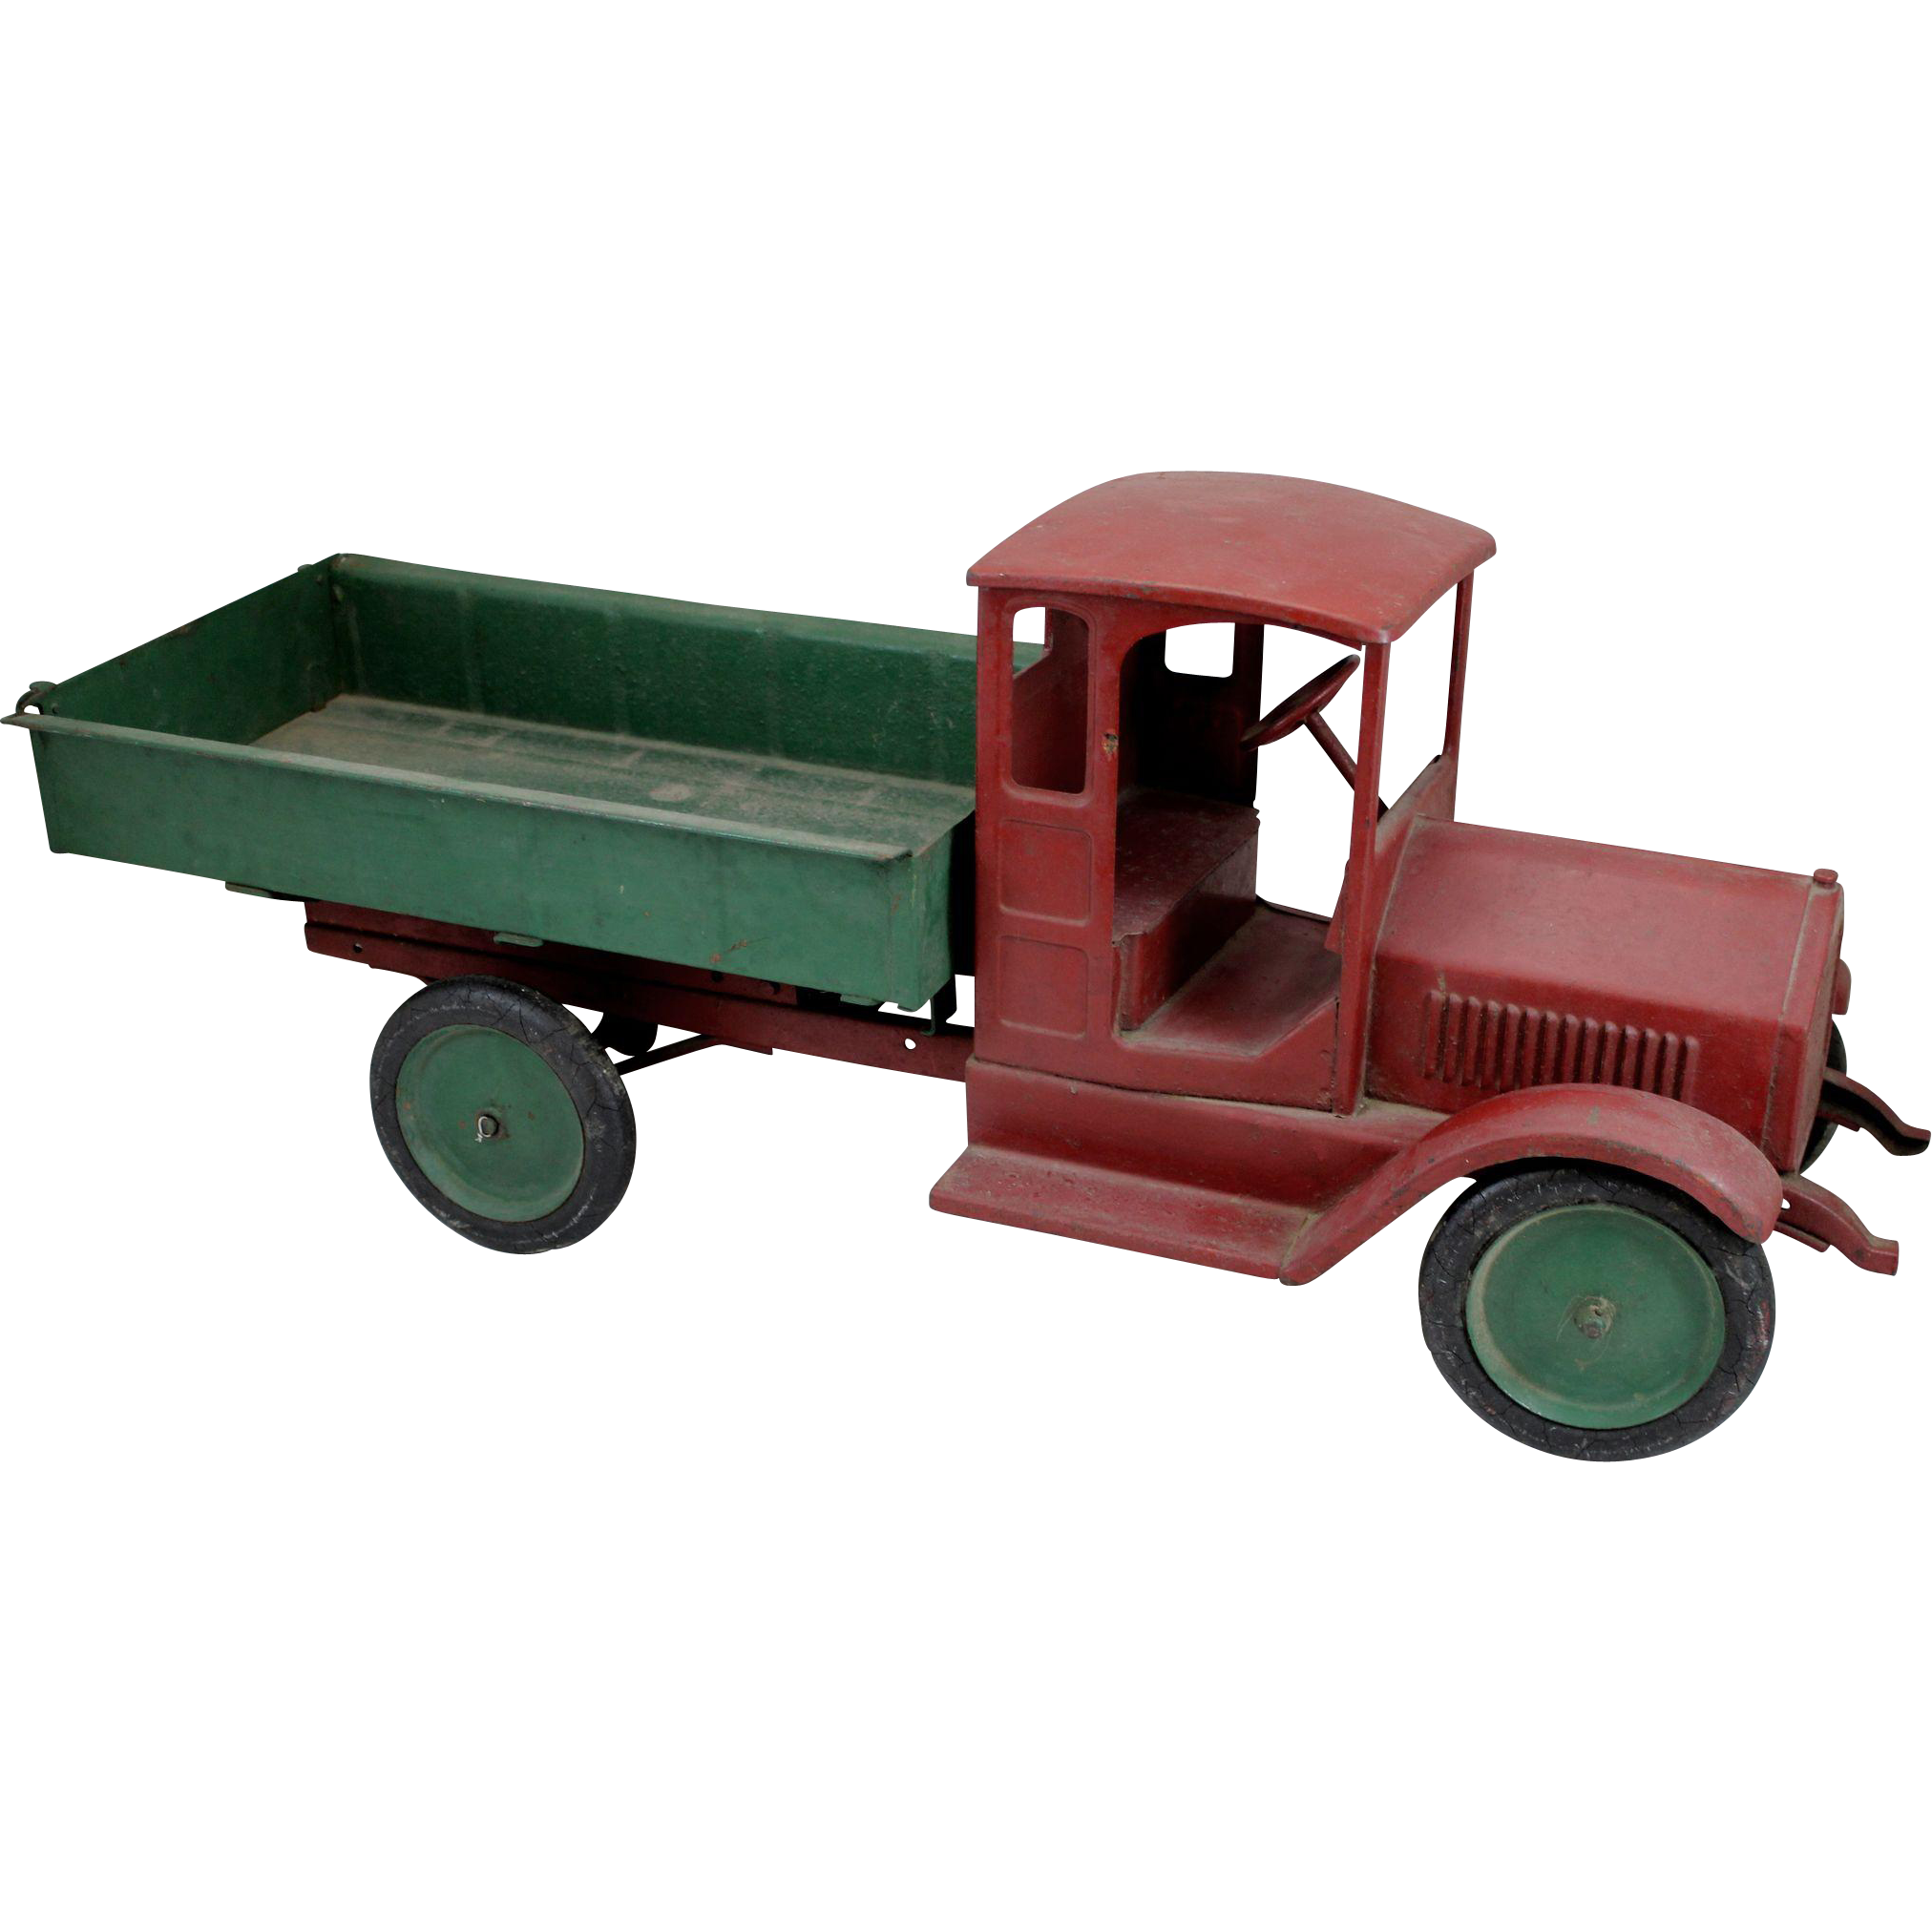 Sturditoy Pressed Steel Toy Dump Truck circa 1926